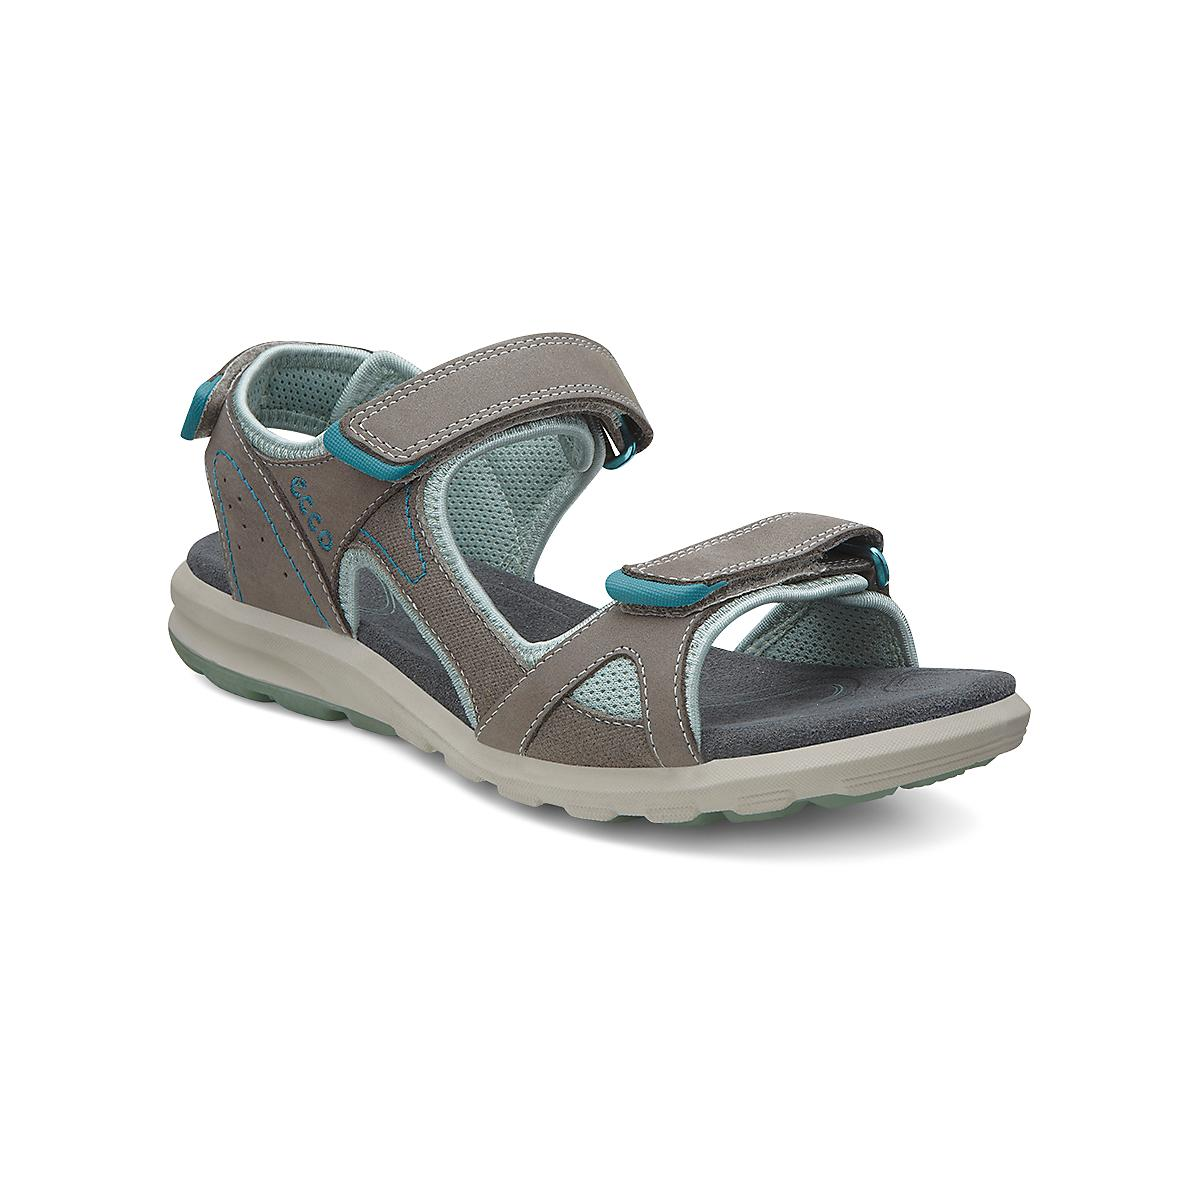 Original Teva OpenToachi Sport Sandals For Women In Stargazer